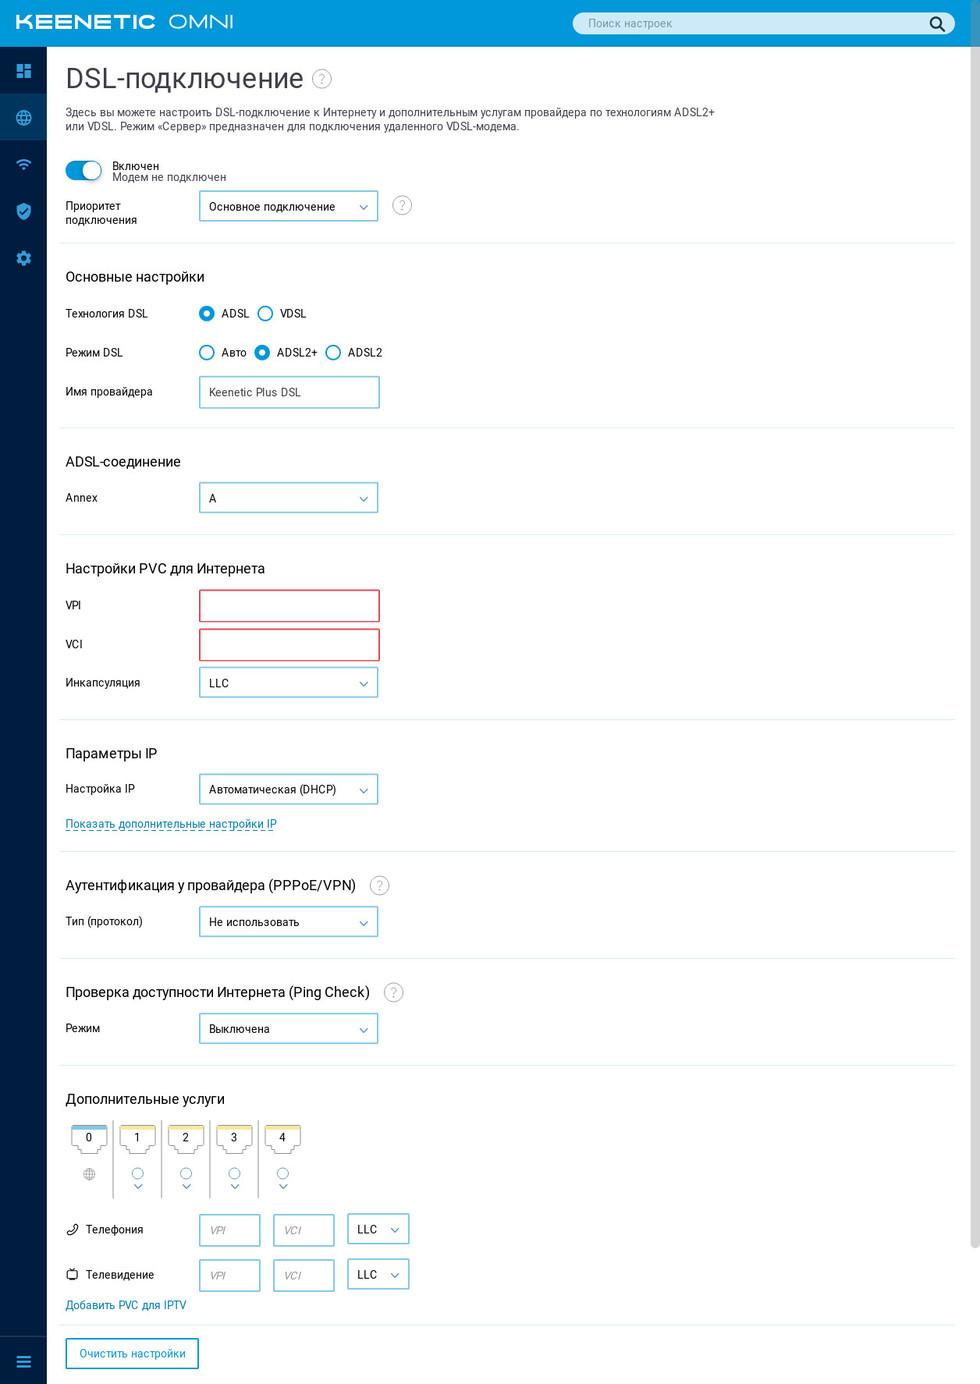 02_интернет_DSL-подключение.jpg